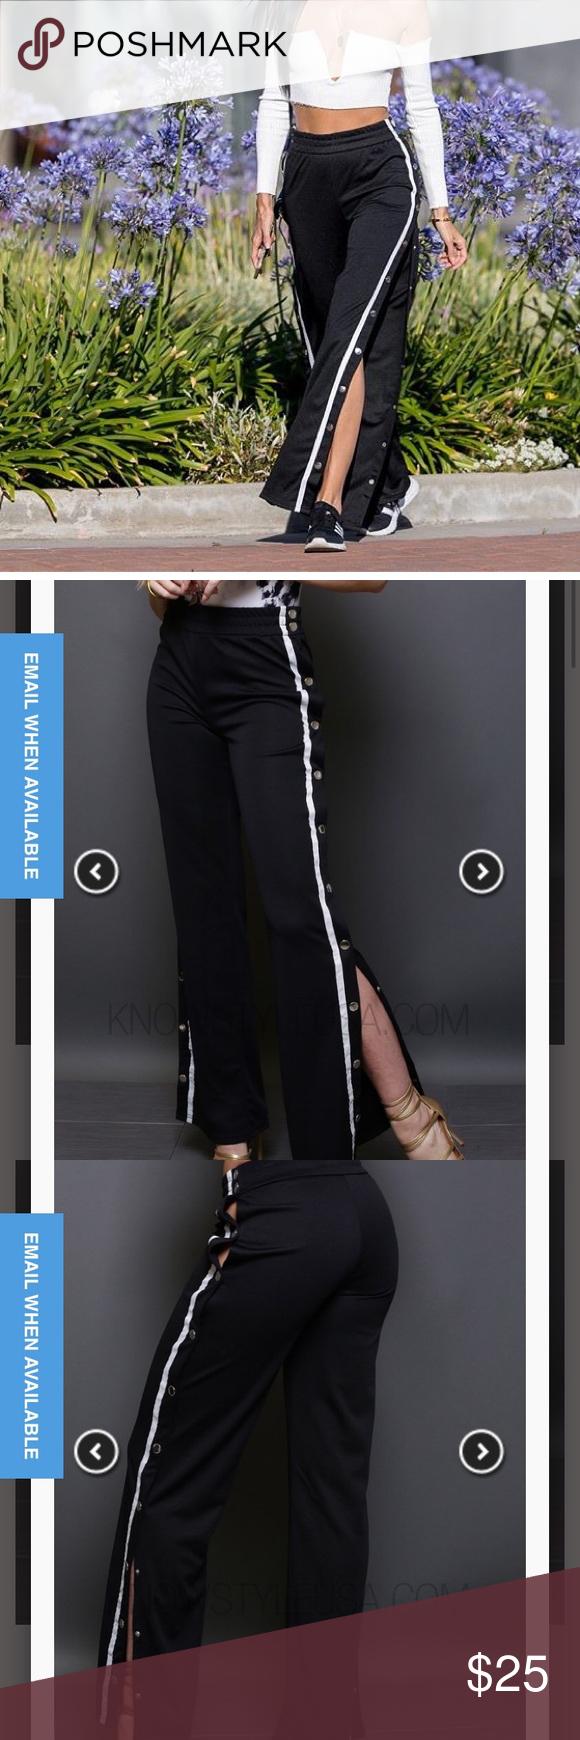 Sold Popper Sweatpants With Images Sweatpants Style Sweatpants Fashion Nova Pants